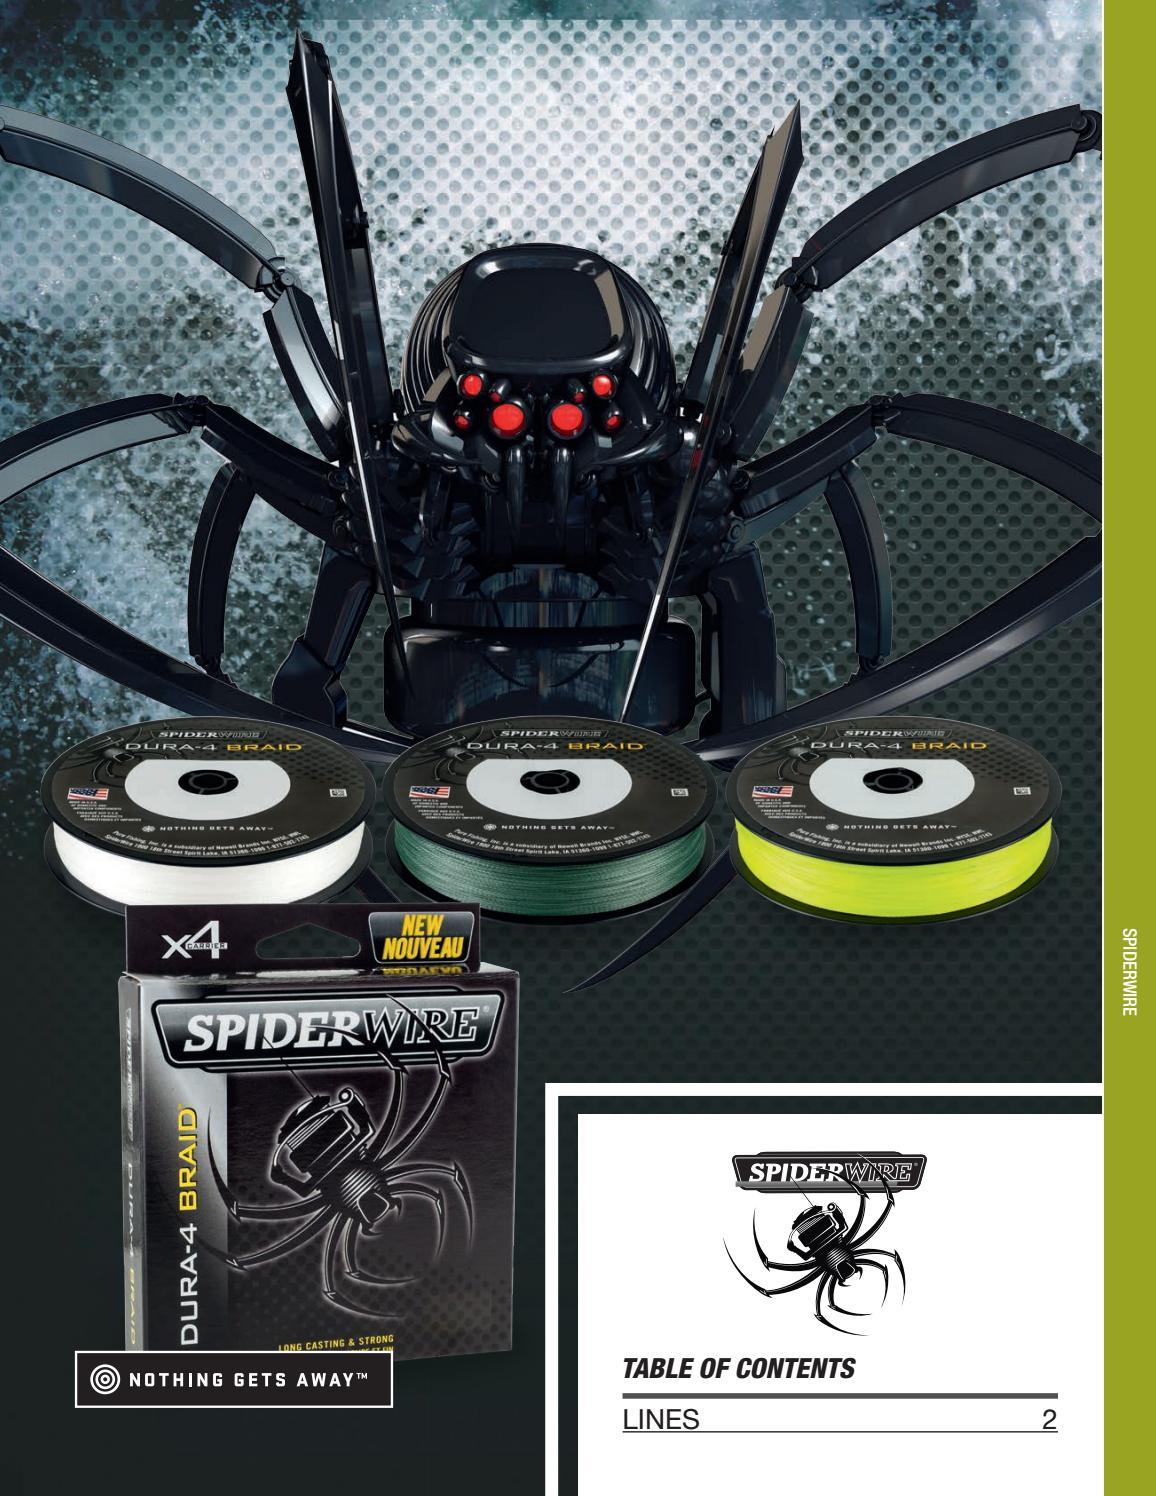 Spiderwire Stealth Smooth 8 Blue Camo 0.25 mm 300 m